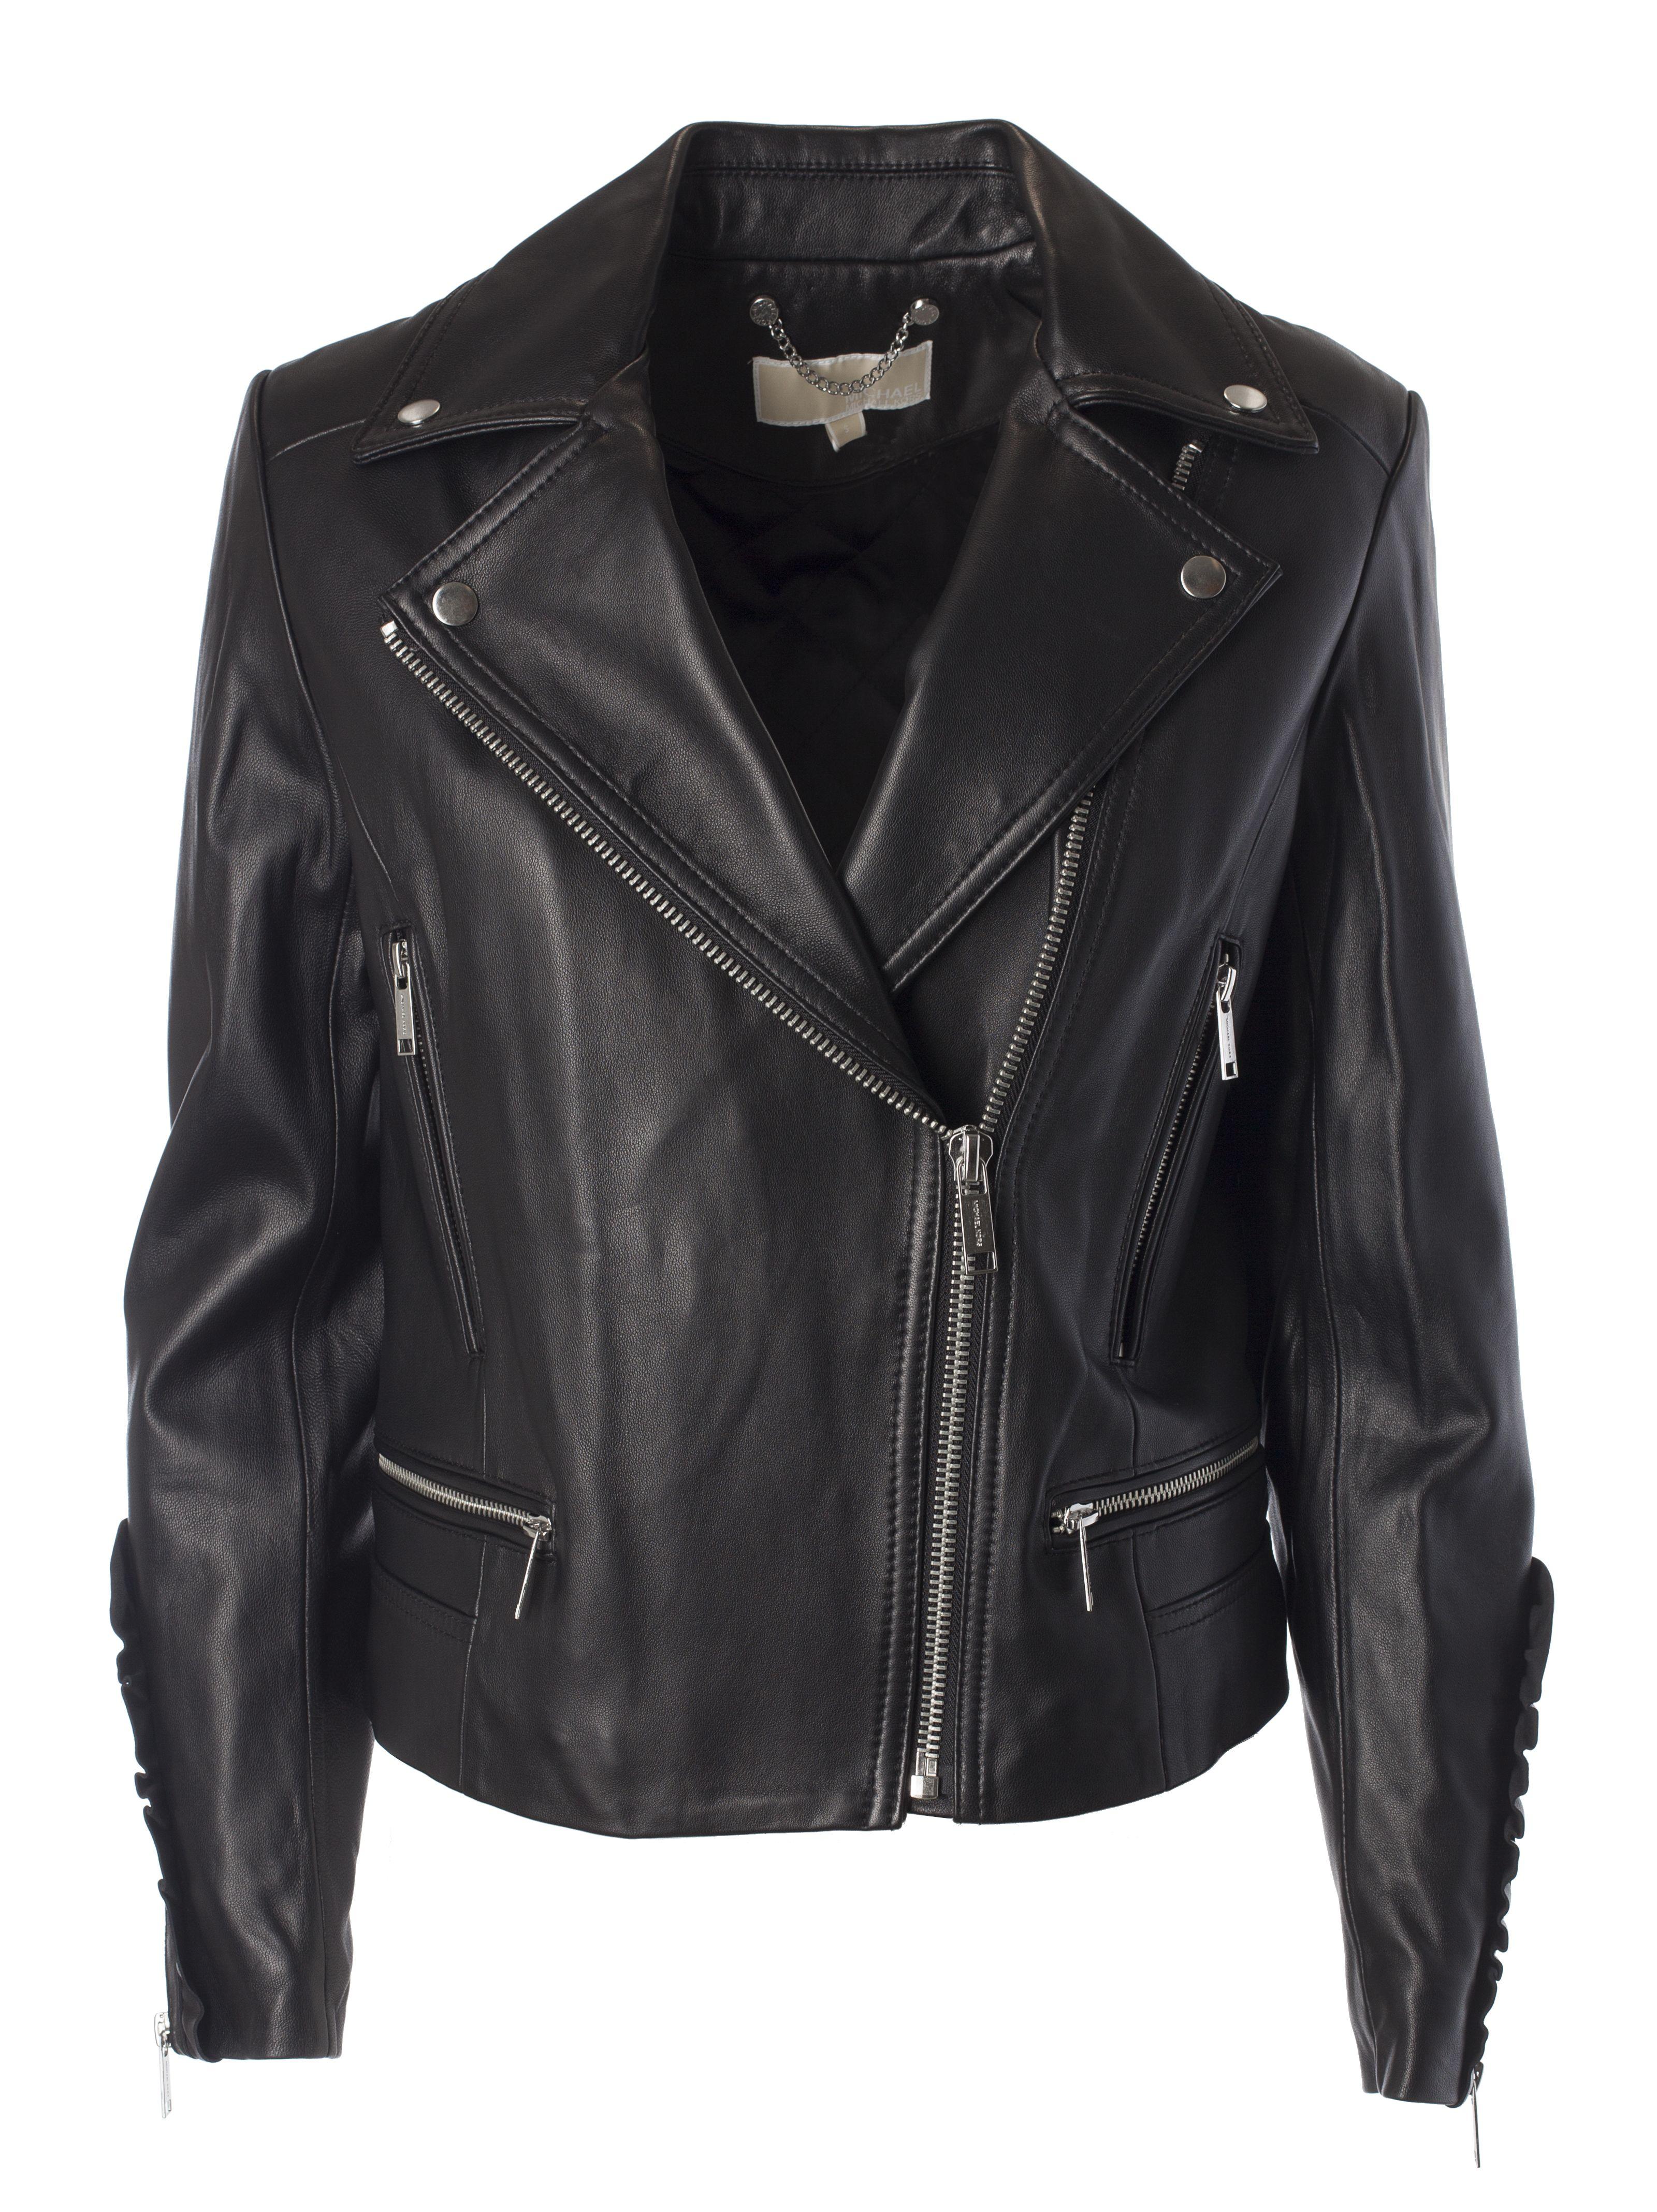 Michael Kors Frill Biker Jacket